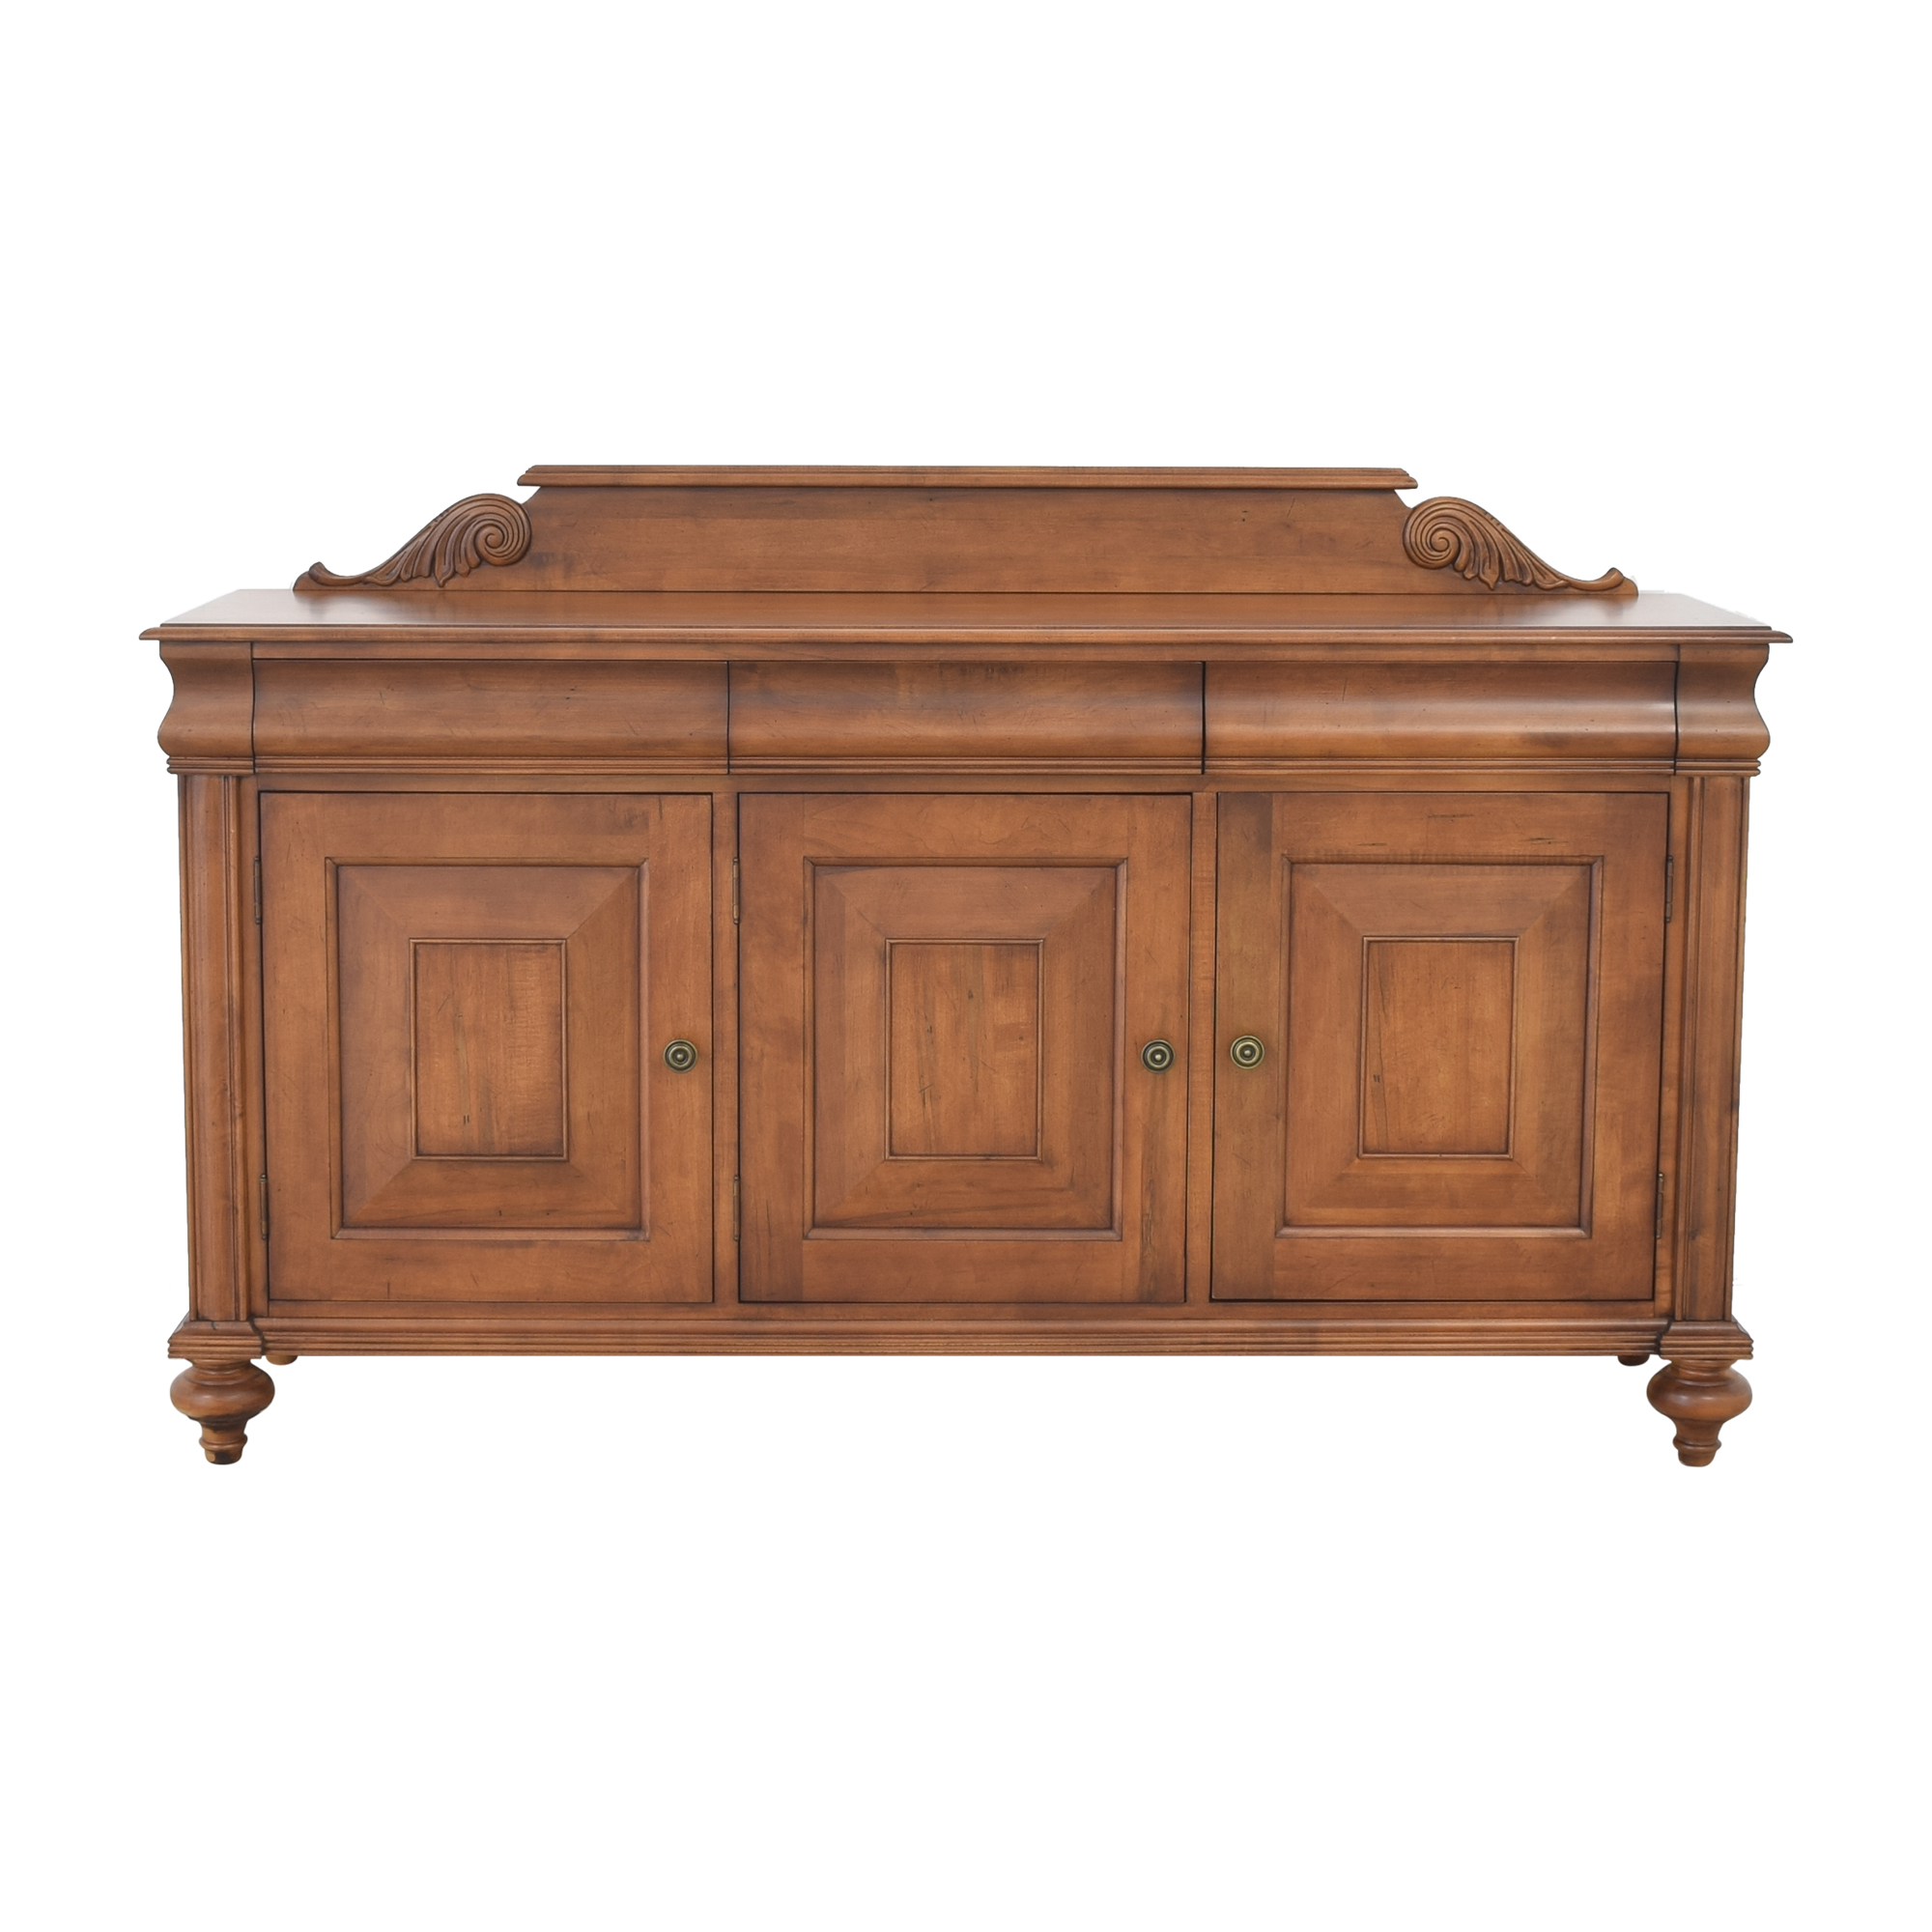 buy Ethan Allen Saxton Buffet Ethan Allen Cabinets & Sideboards